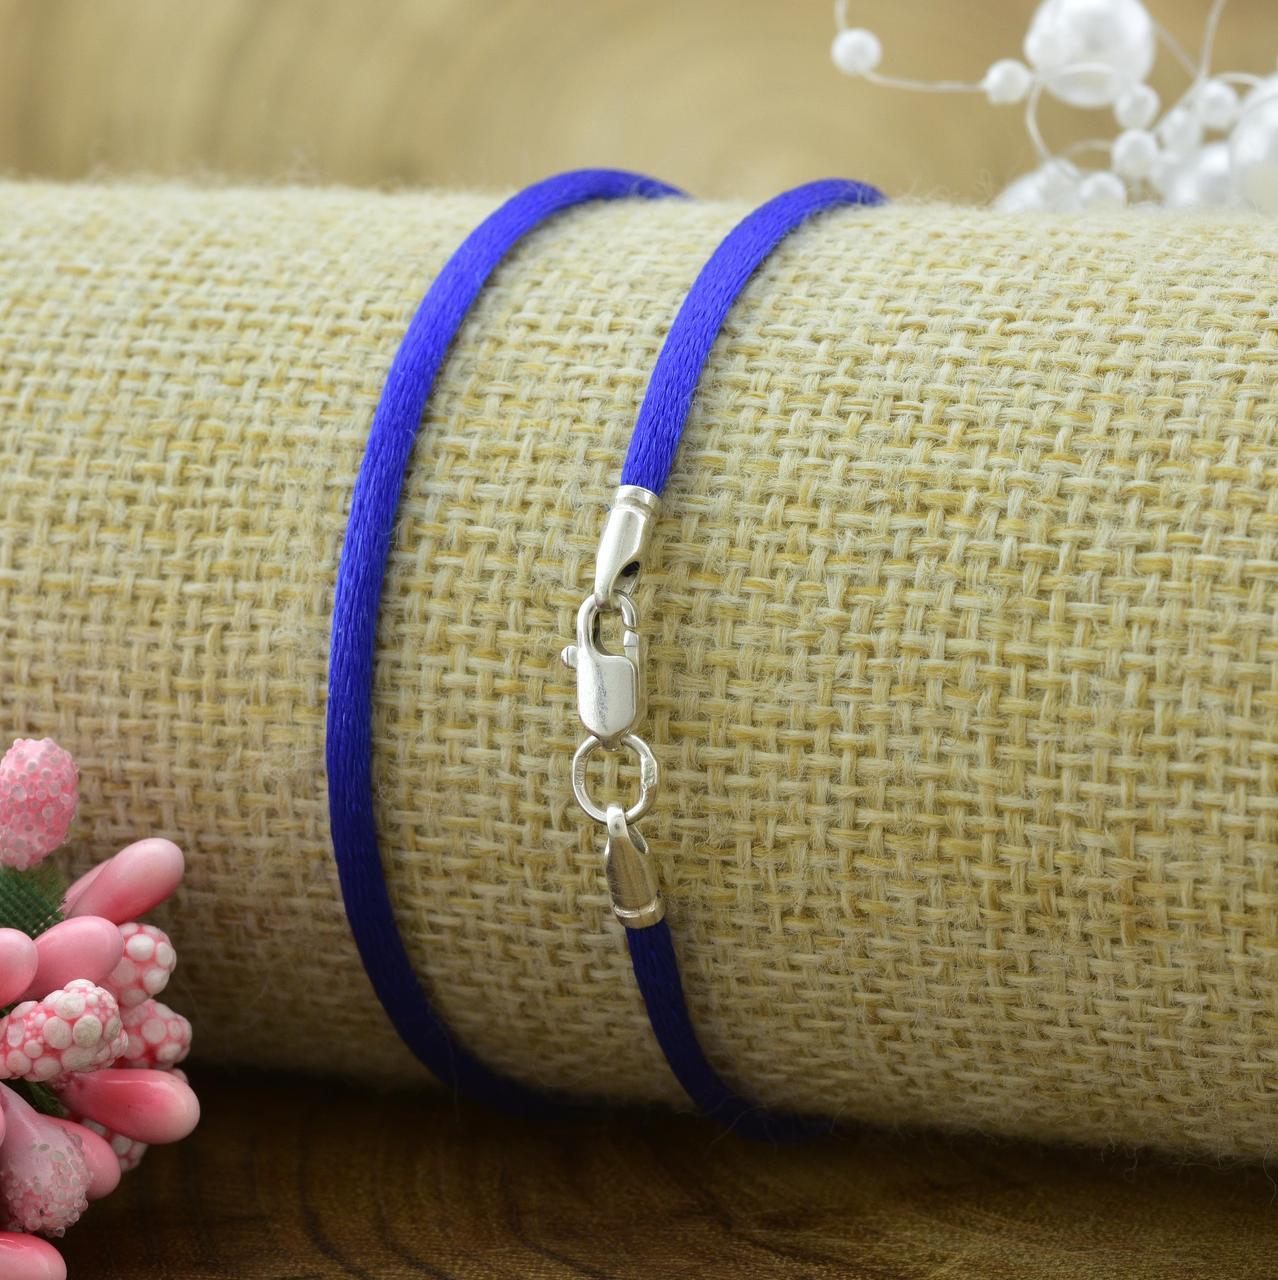 Шнурок шелковый цвет синий длина 45 см ширина 2 мм вес серебра 0.7 г